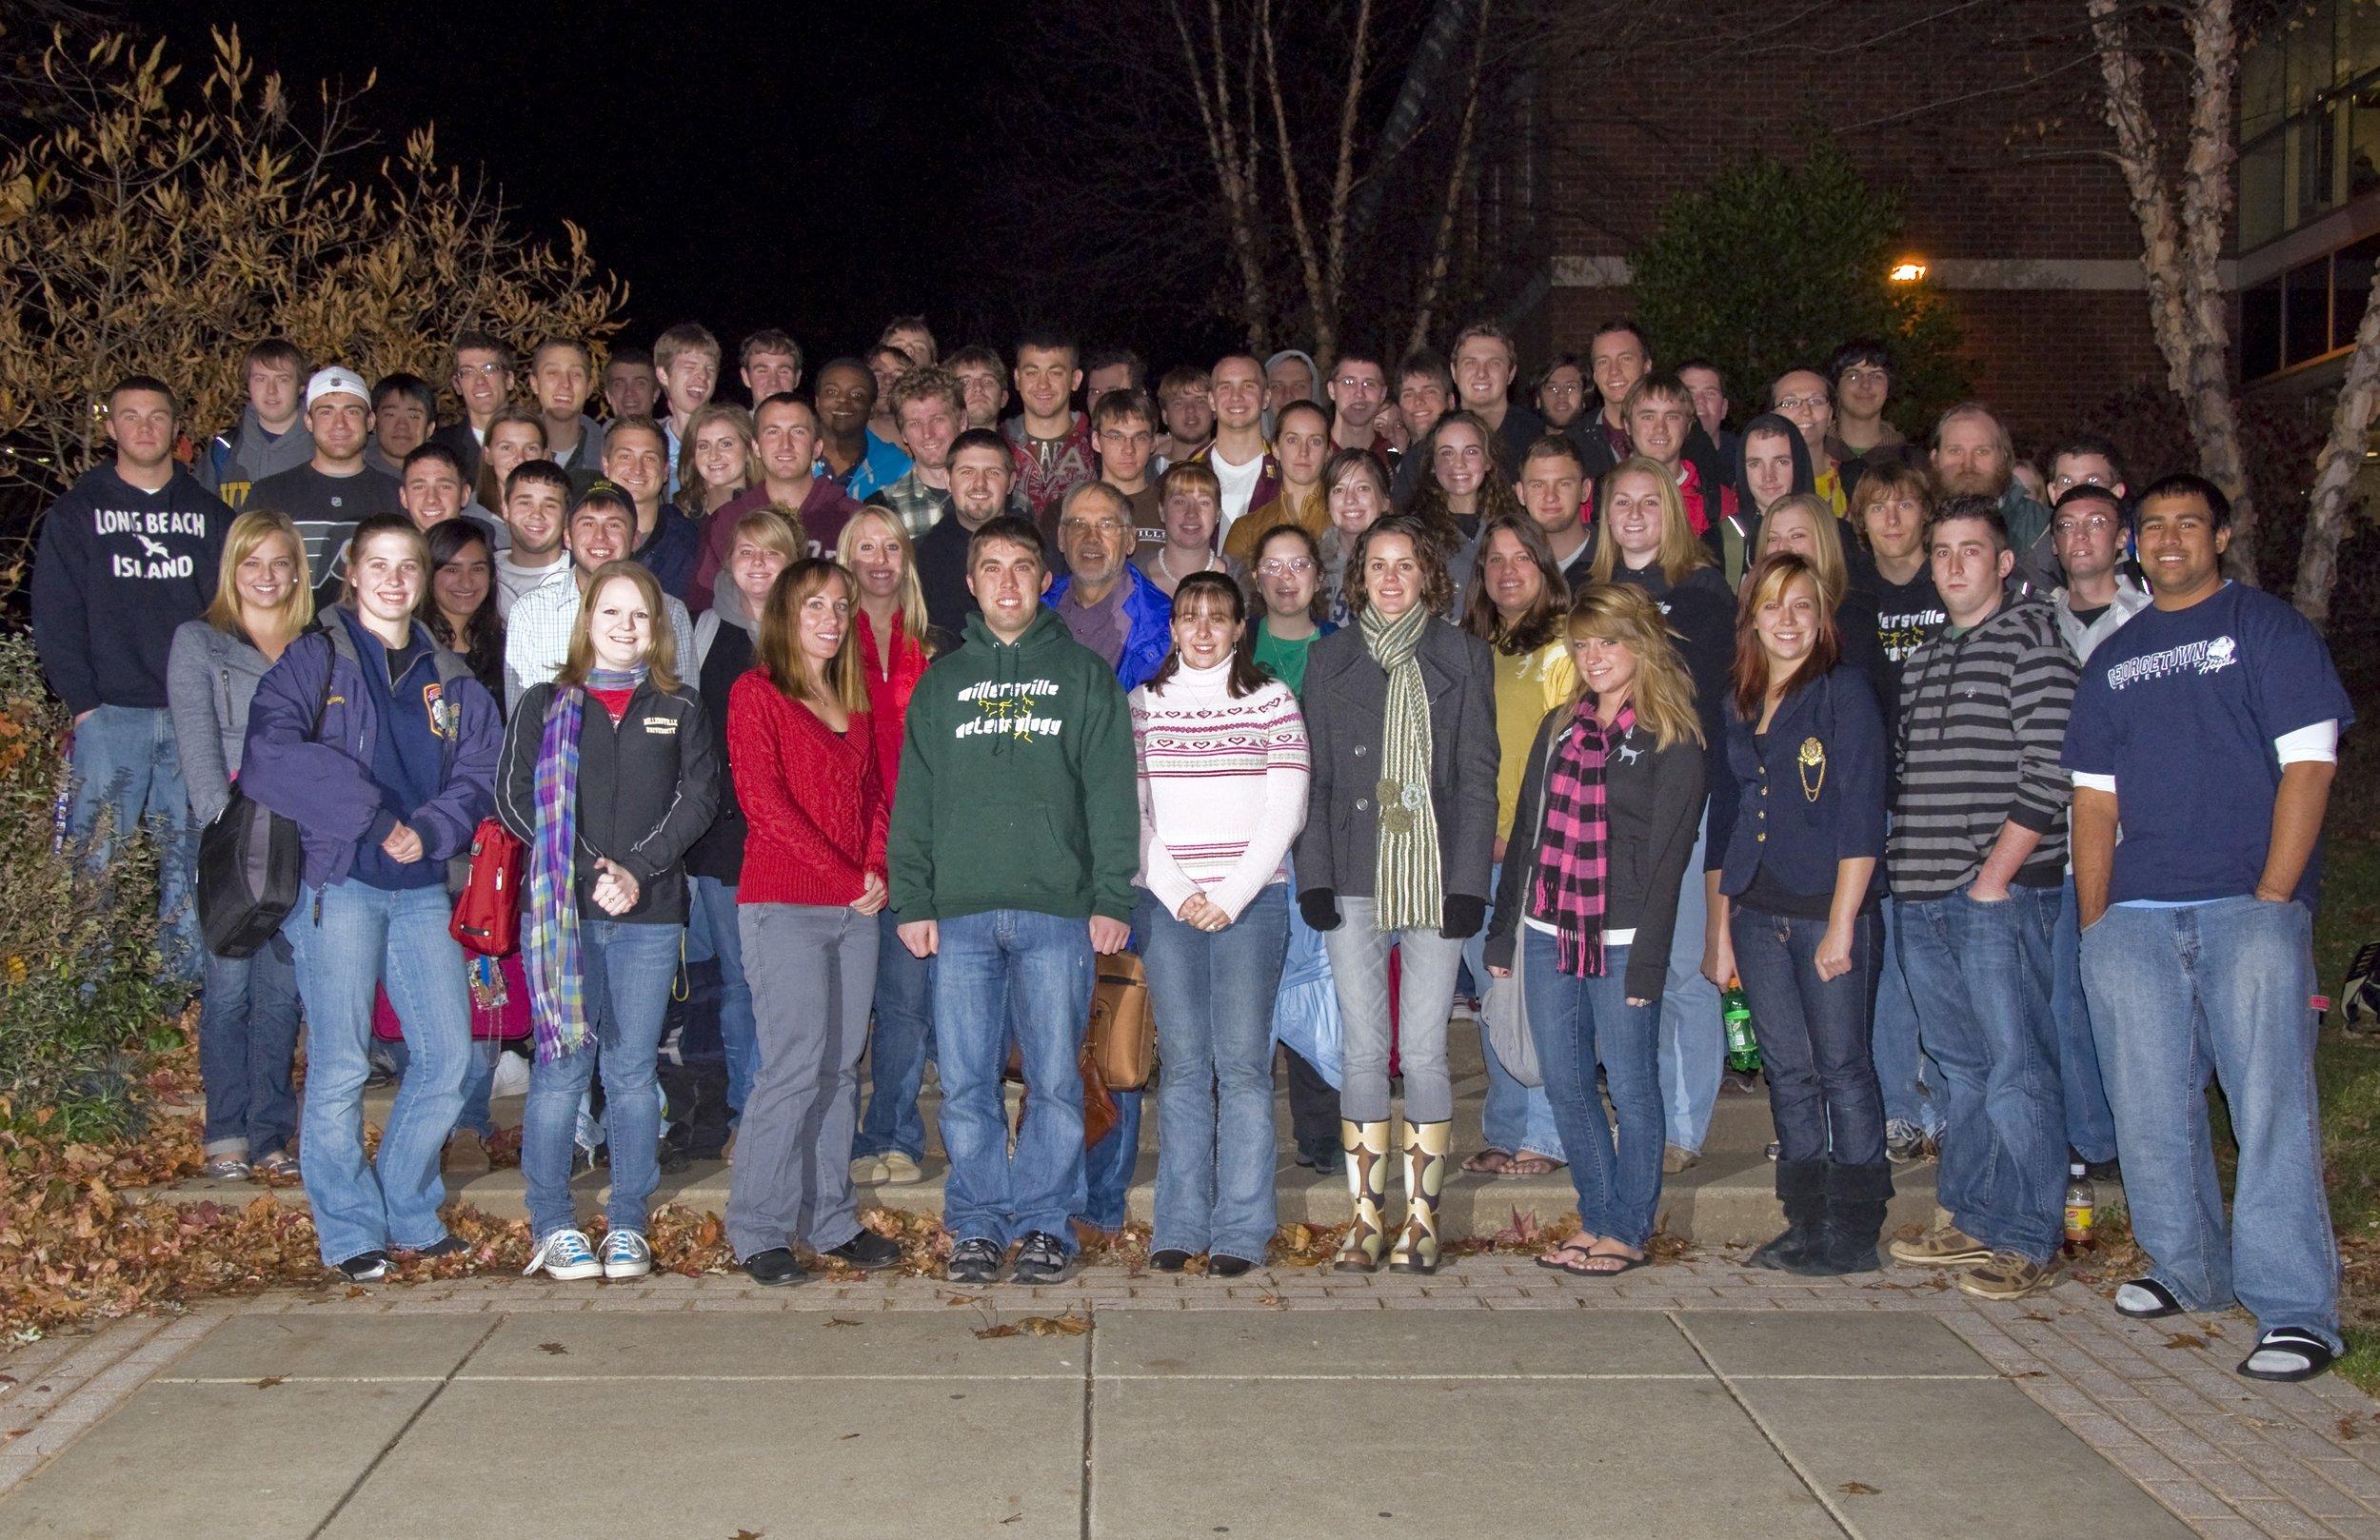 2009-2010 AMS Group Photo.jpg